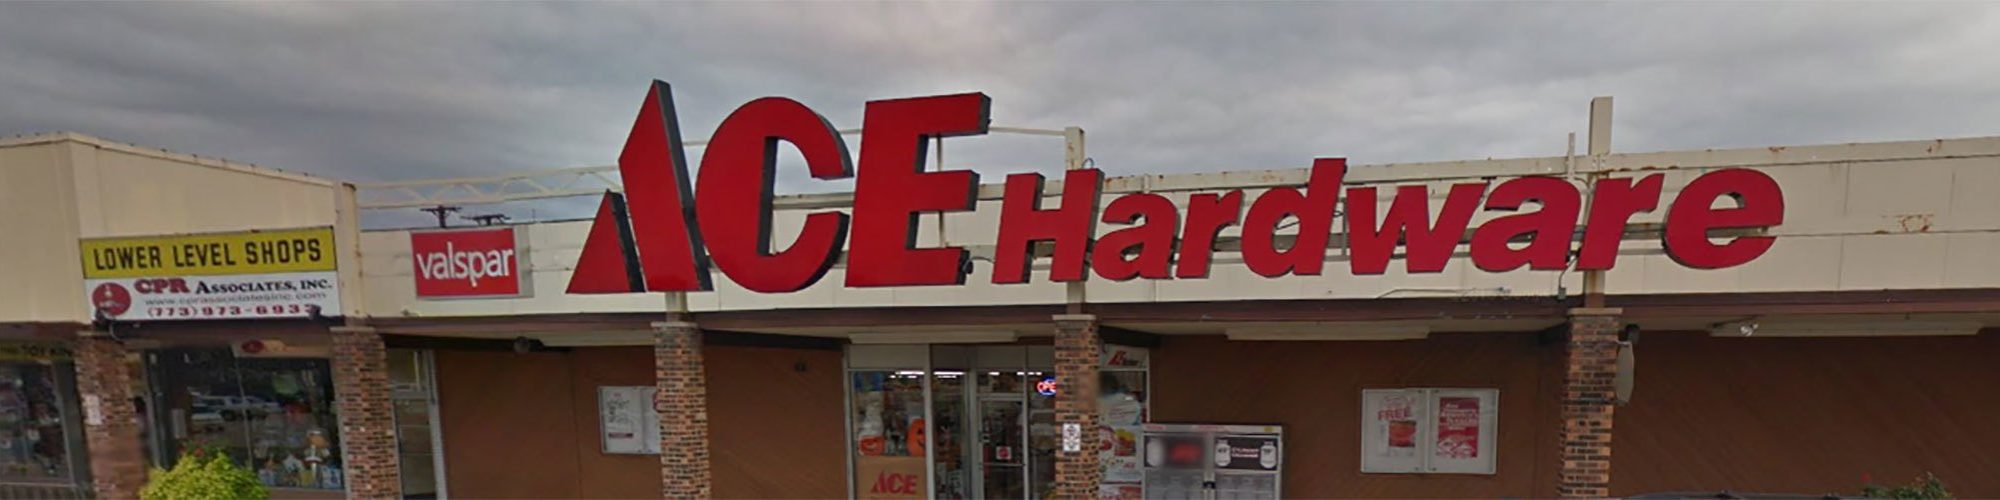 Gordon's Ace Hardware | Ace Hardware in Chicago